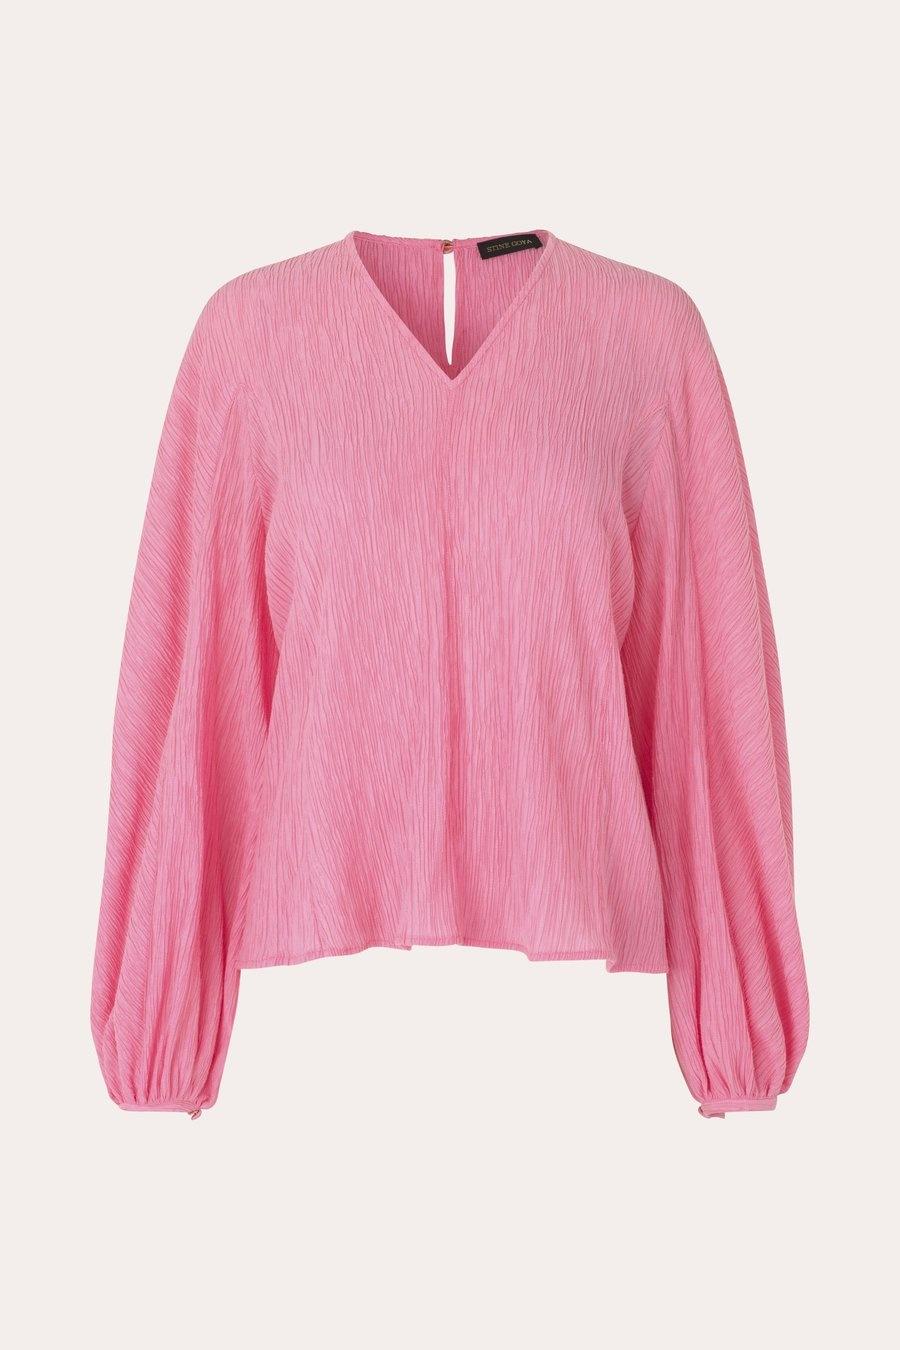 Ida Crinkled Tencel blouse Pink-1